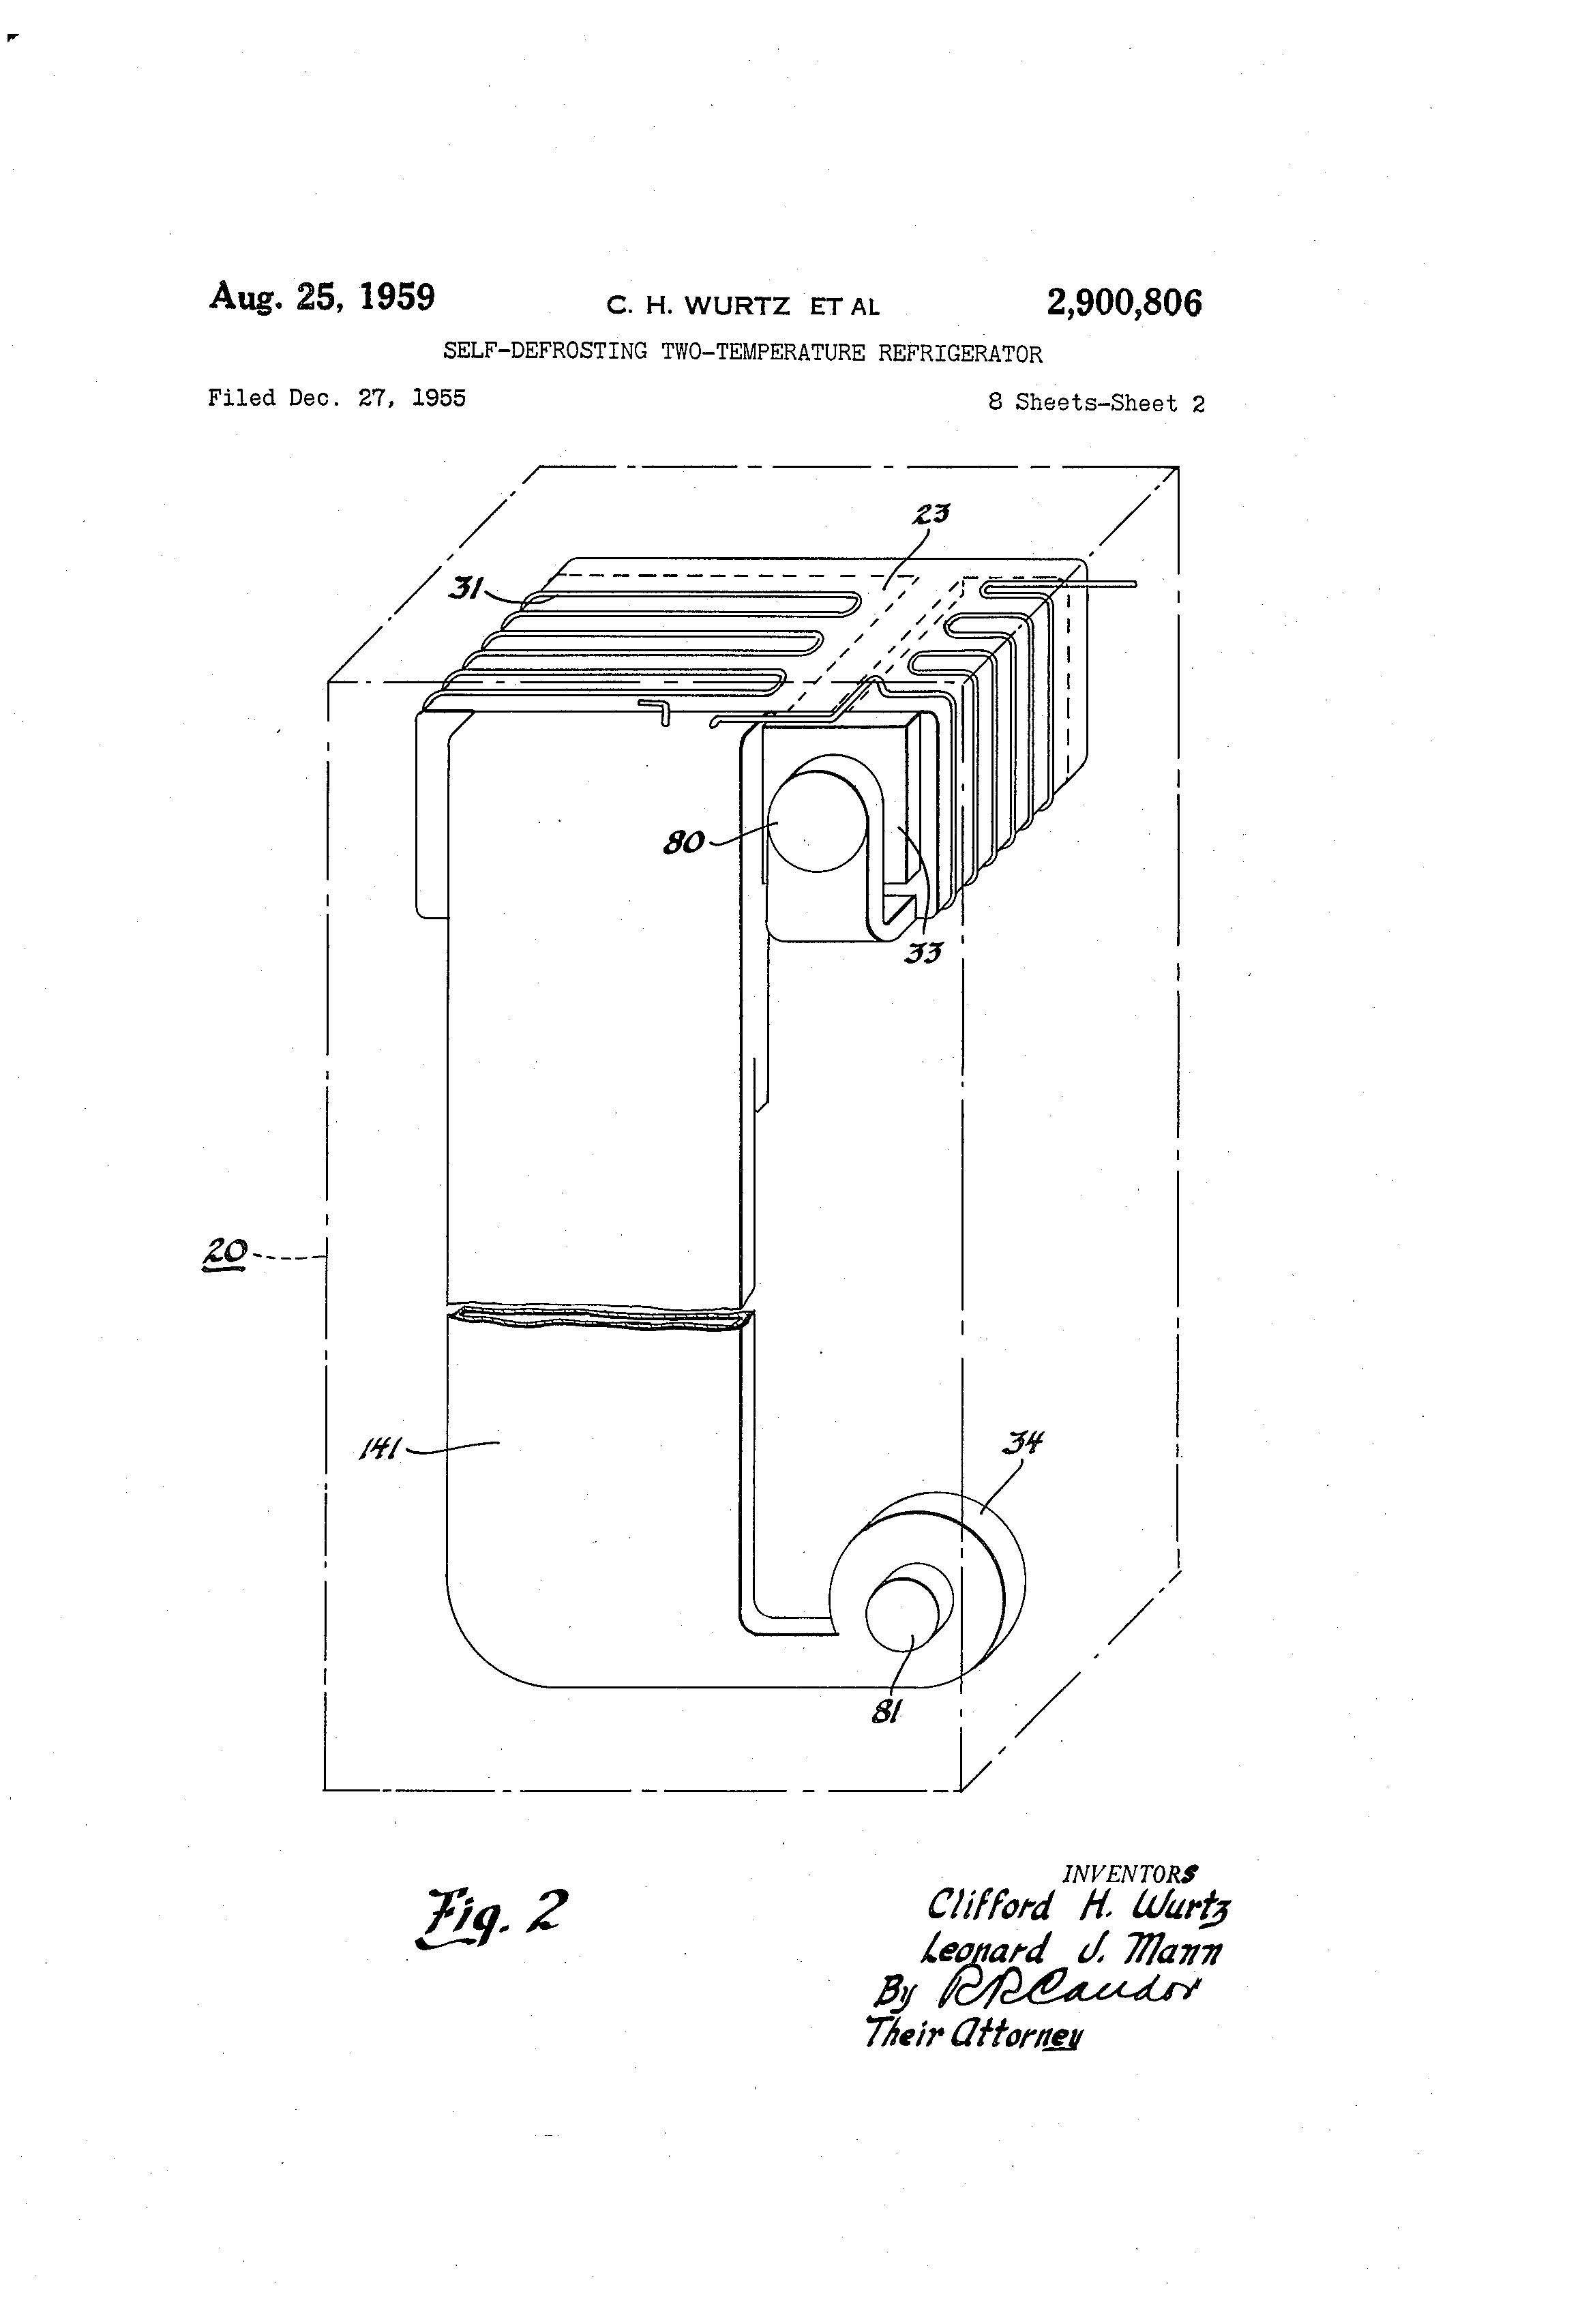 Clifford 5 806x Wiring Diagram Schema Diagrams Matrix 1 Patent Us2900806 Self Defrosting Two Temperature Refrigerator